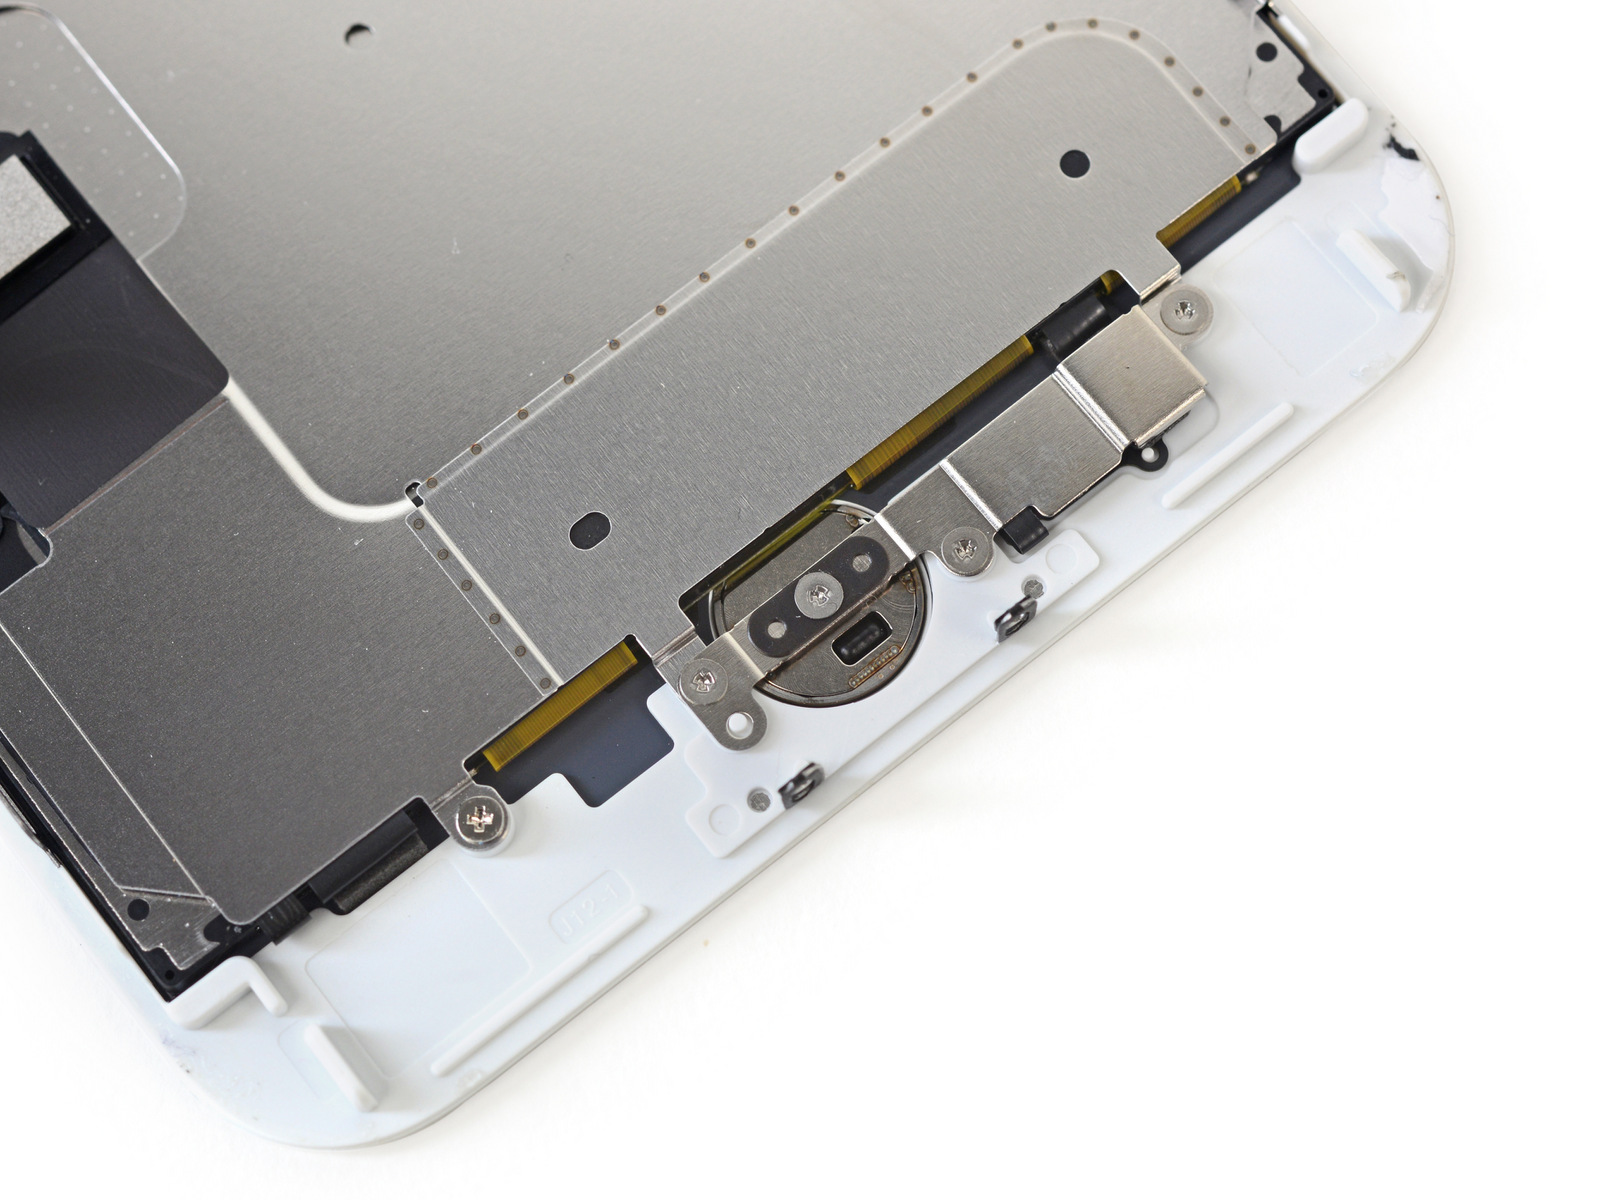 Botón Home táctil del iPhone 7 Plus